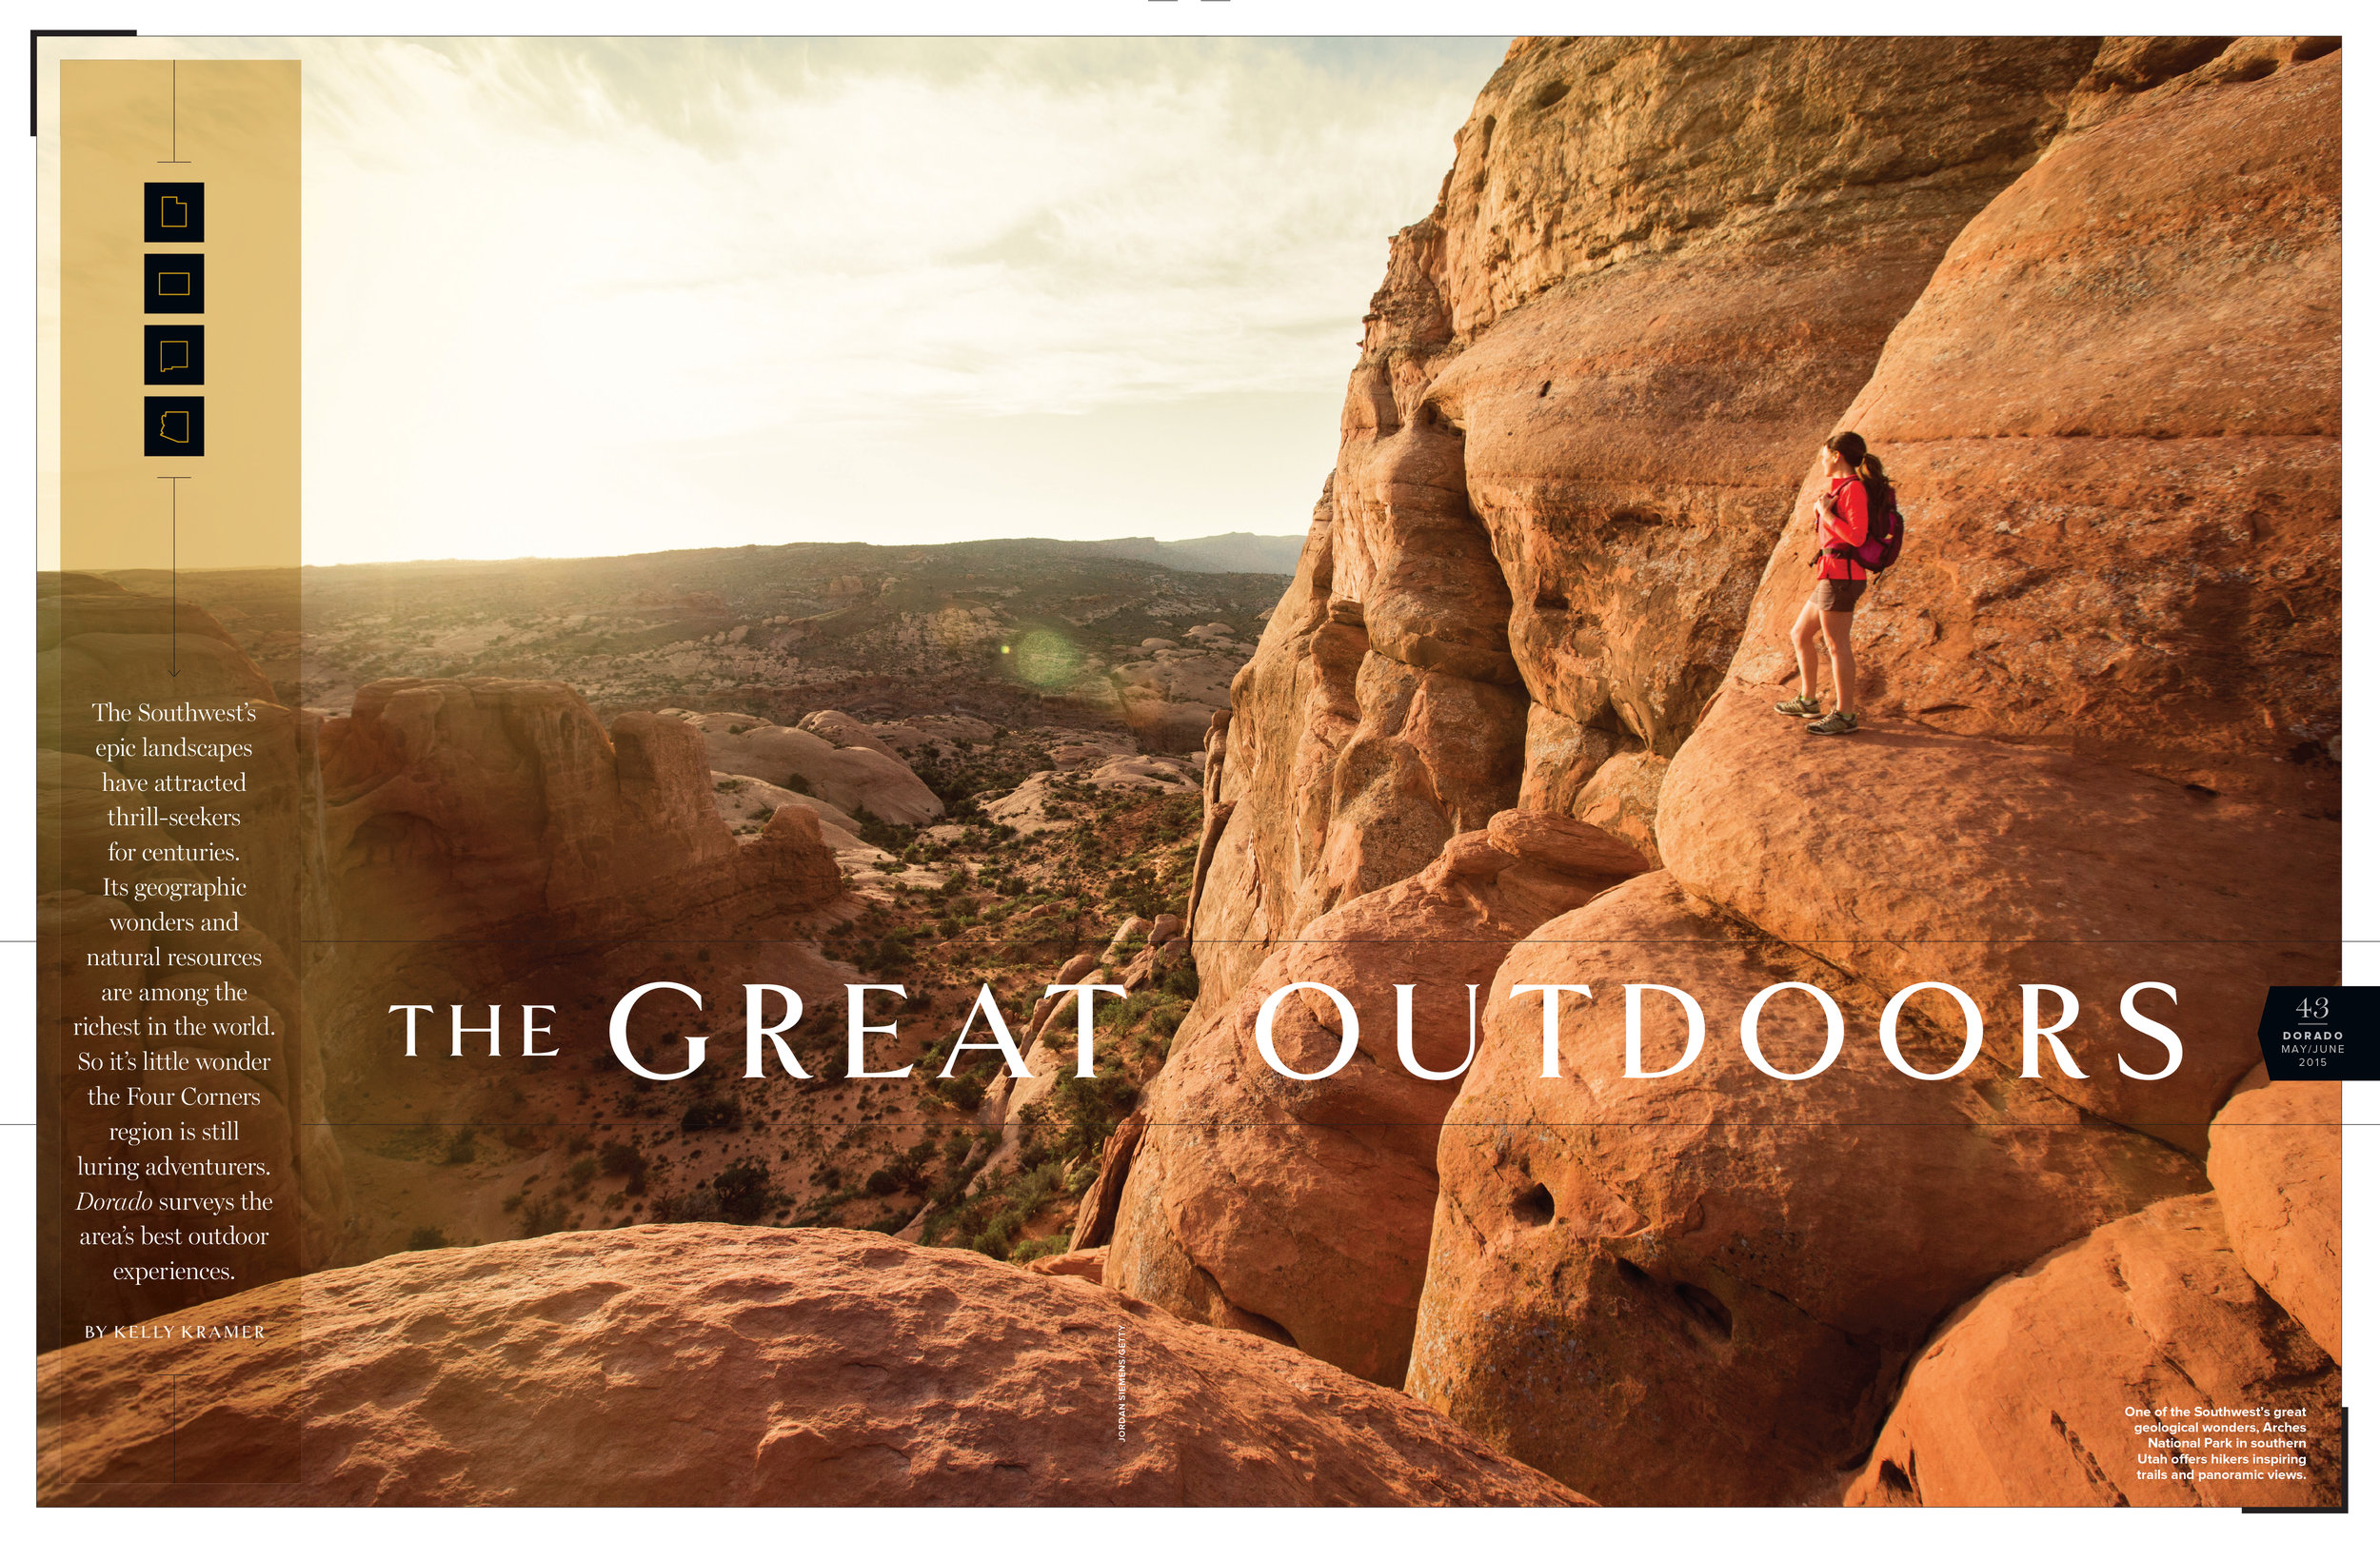 Dorado_0515_43_great_outdoors_x1a.jpg